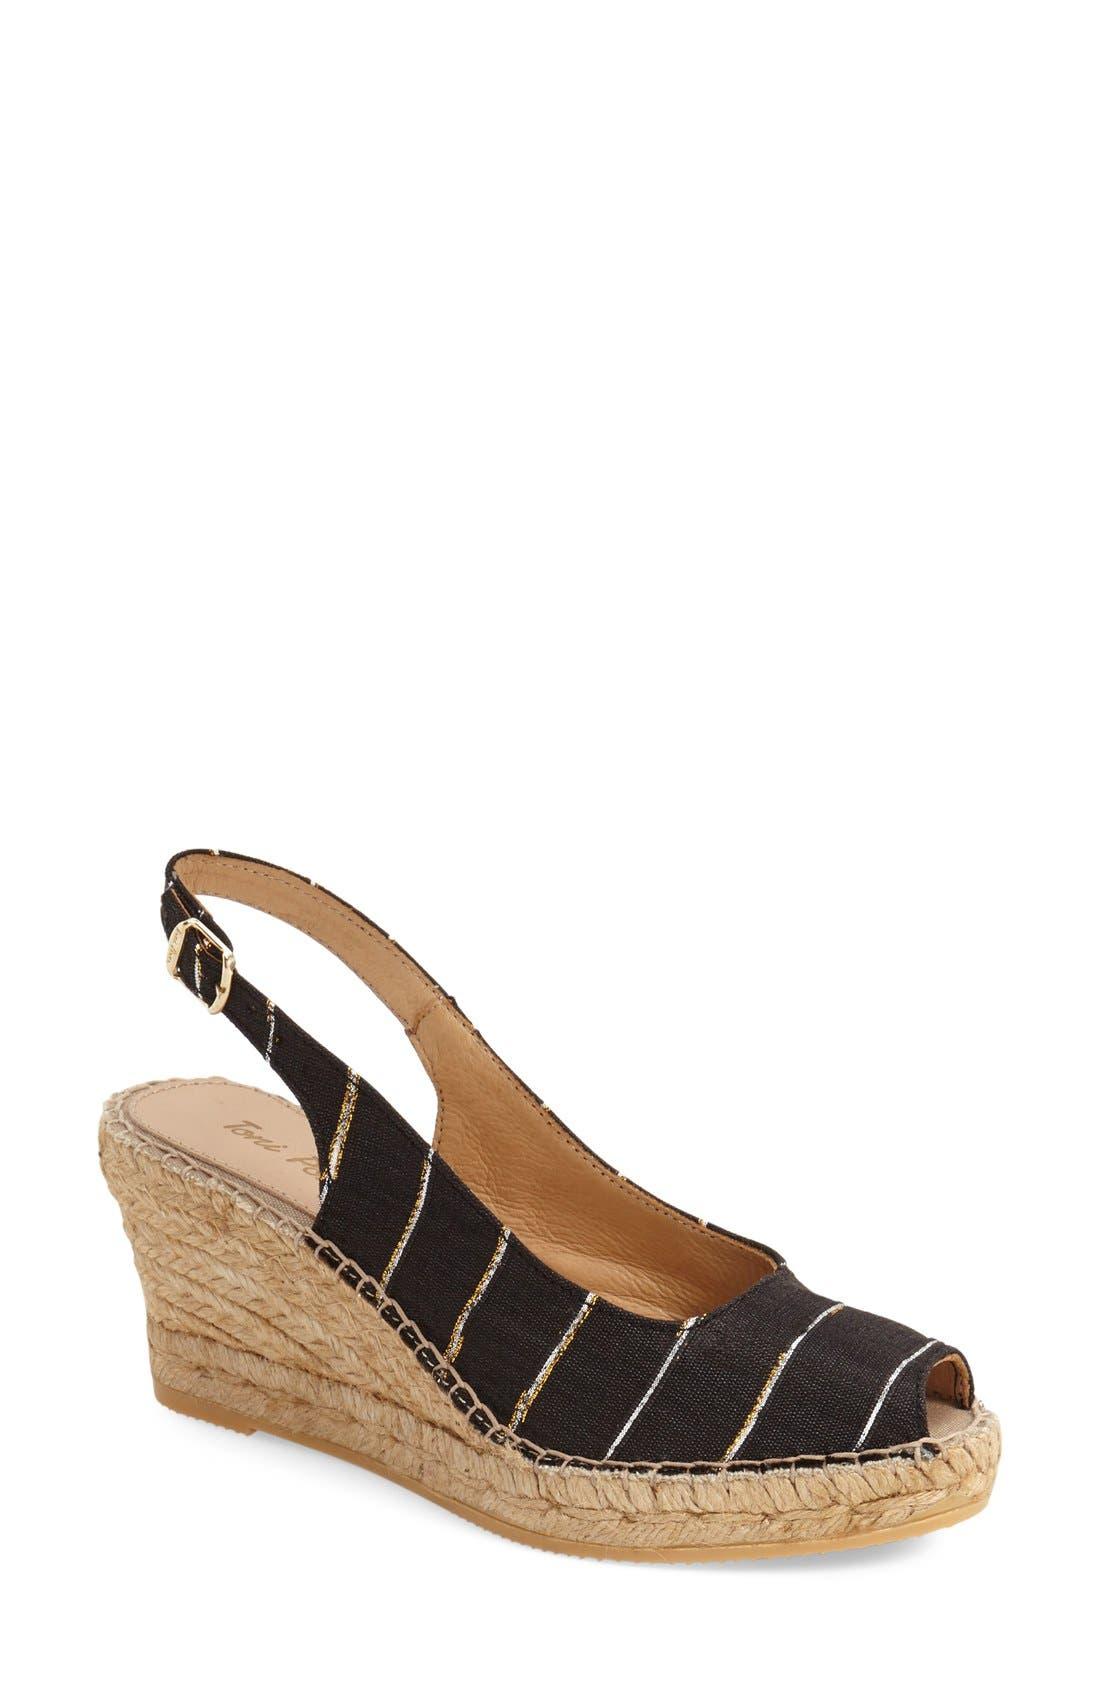 Alternate Image 1 Selected - Toni Pons 'Carmina' Silk Slingback Wedge Sandal (Women)